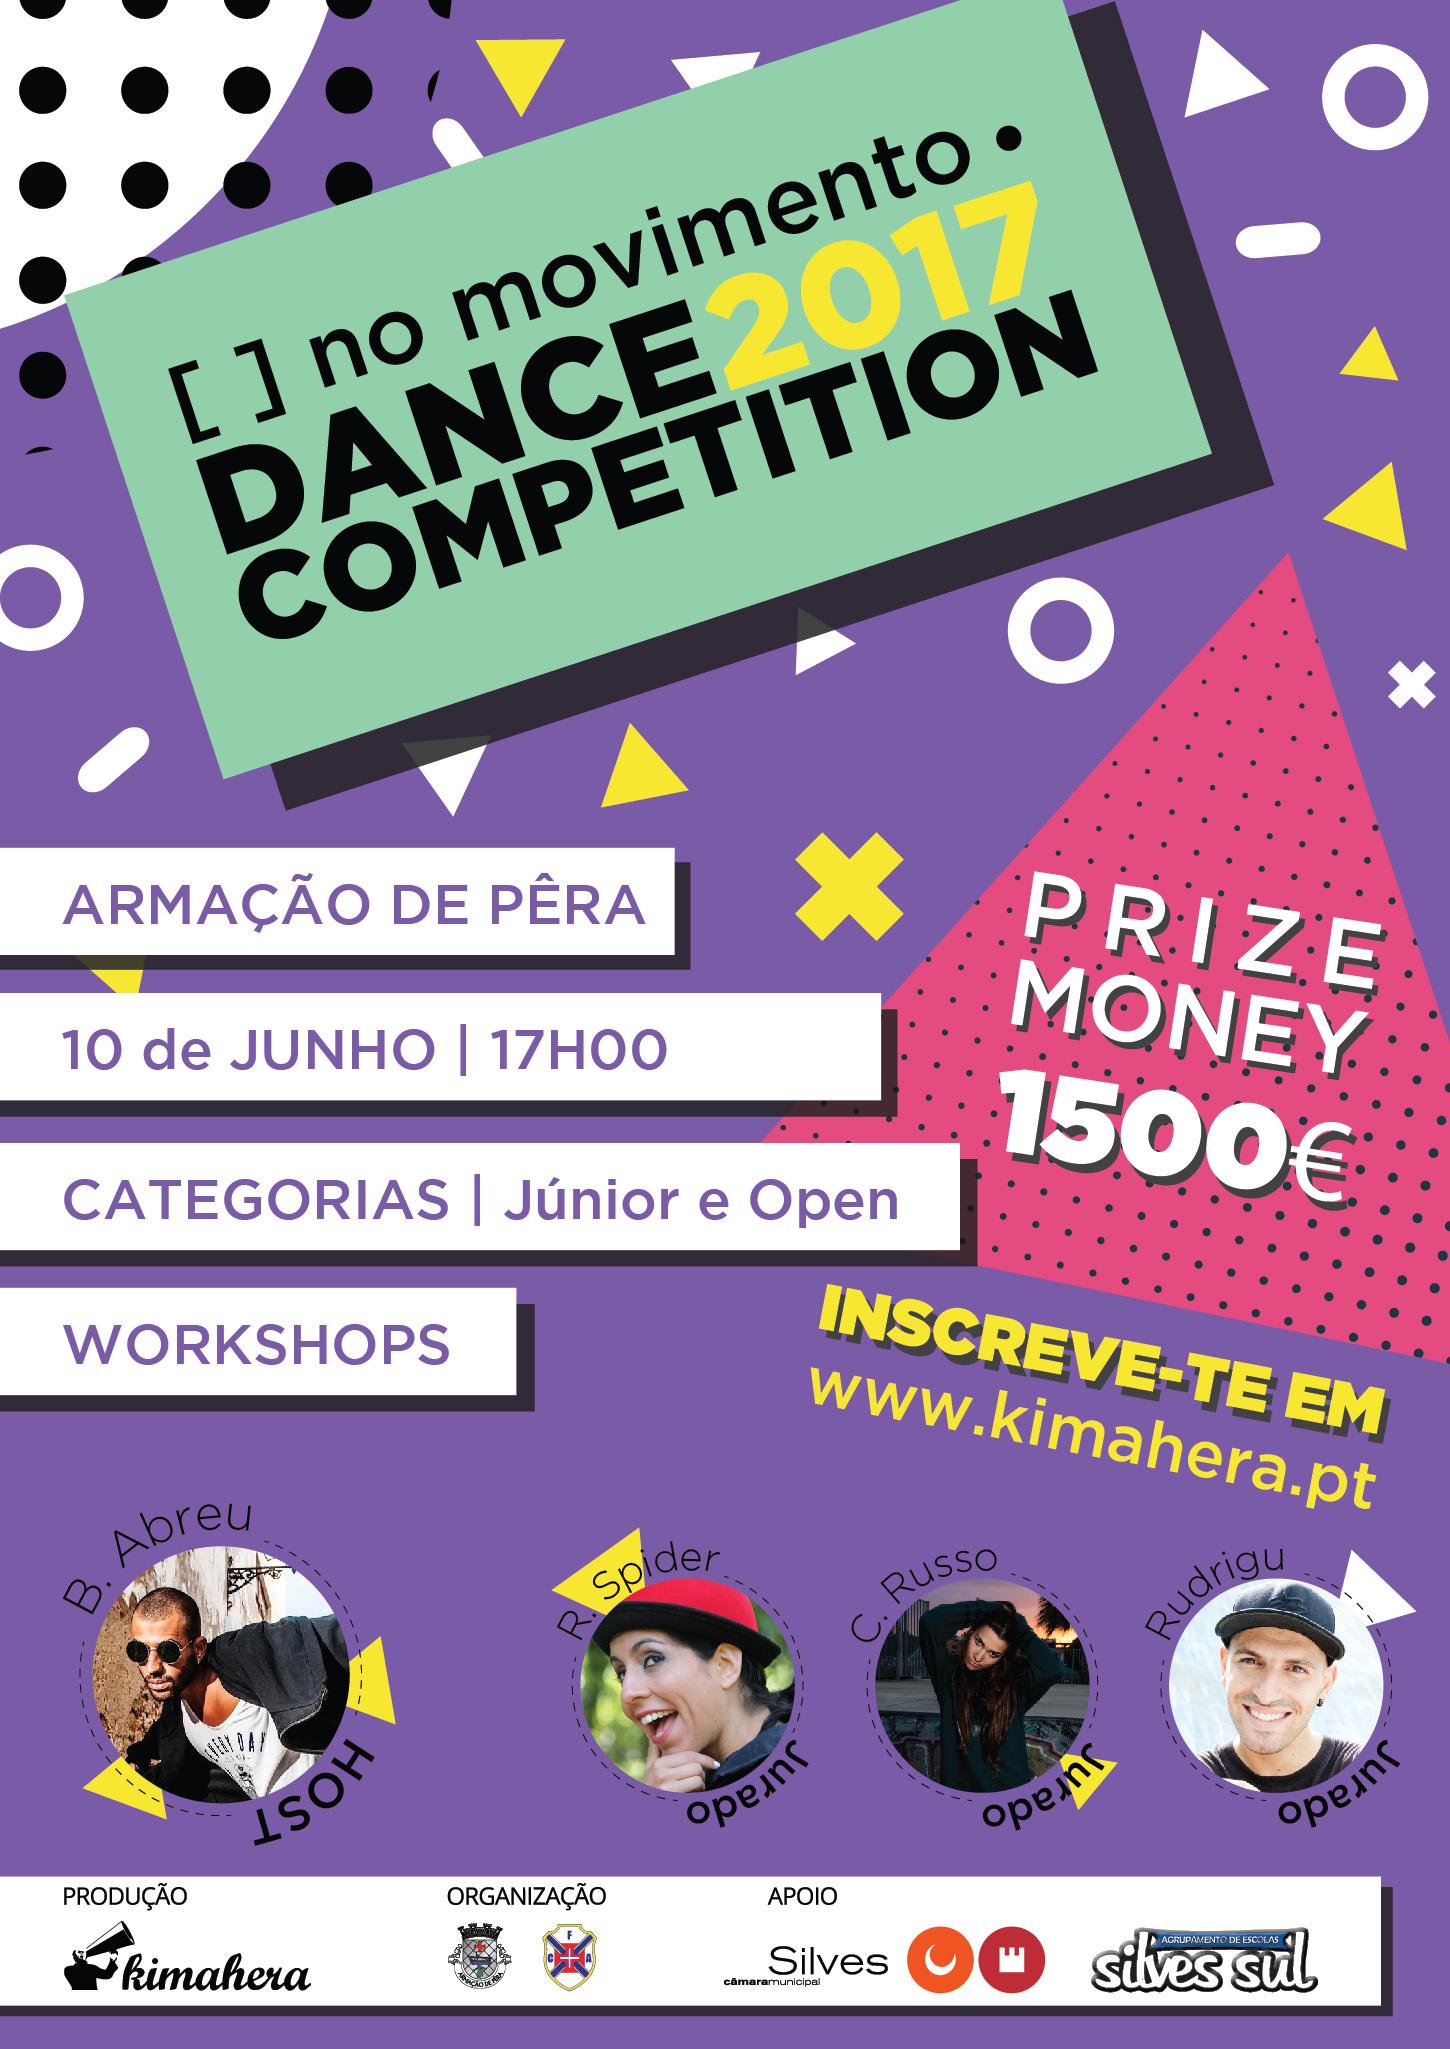 [ ] no movimento • Dance Competition 2017